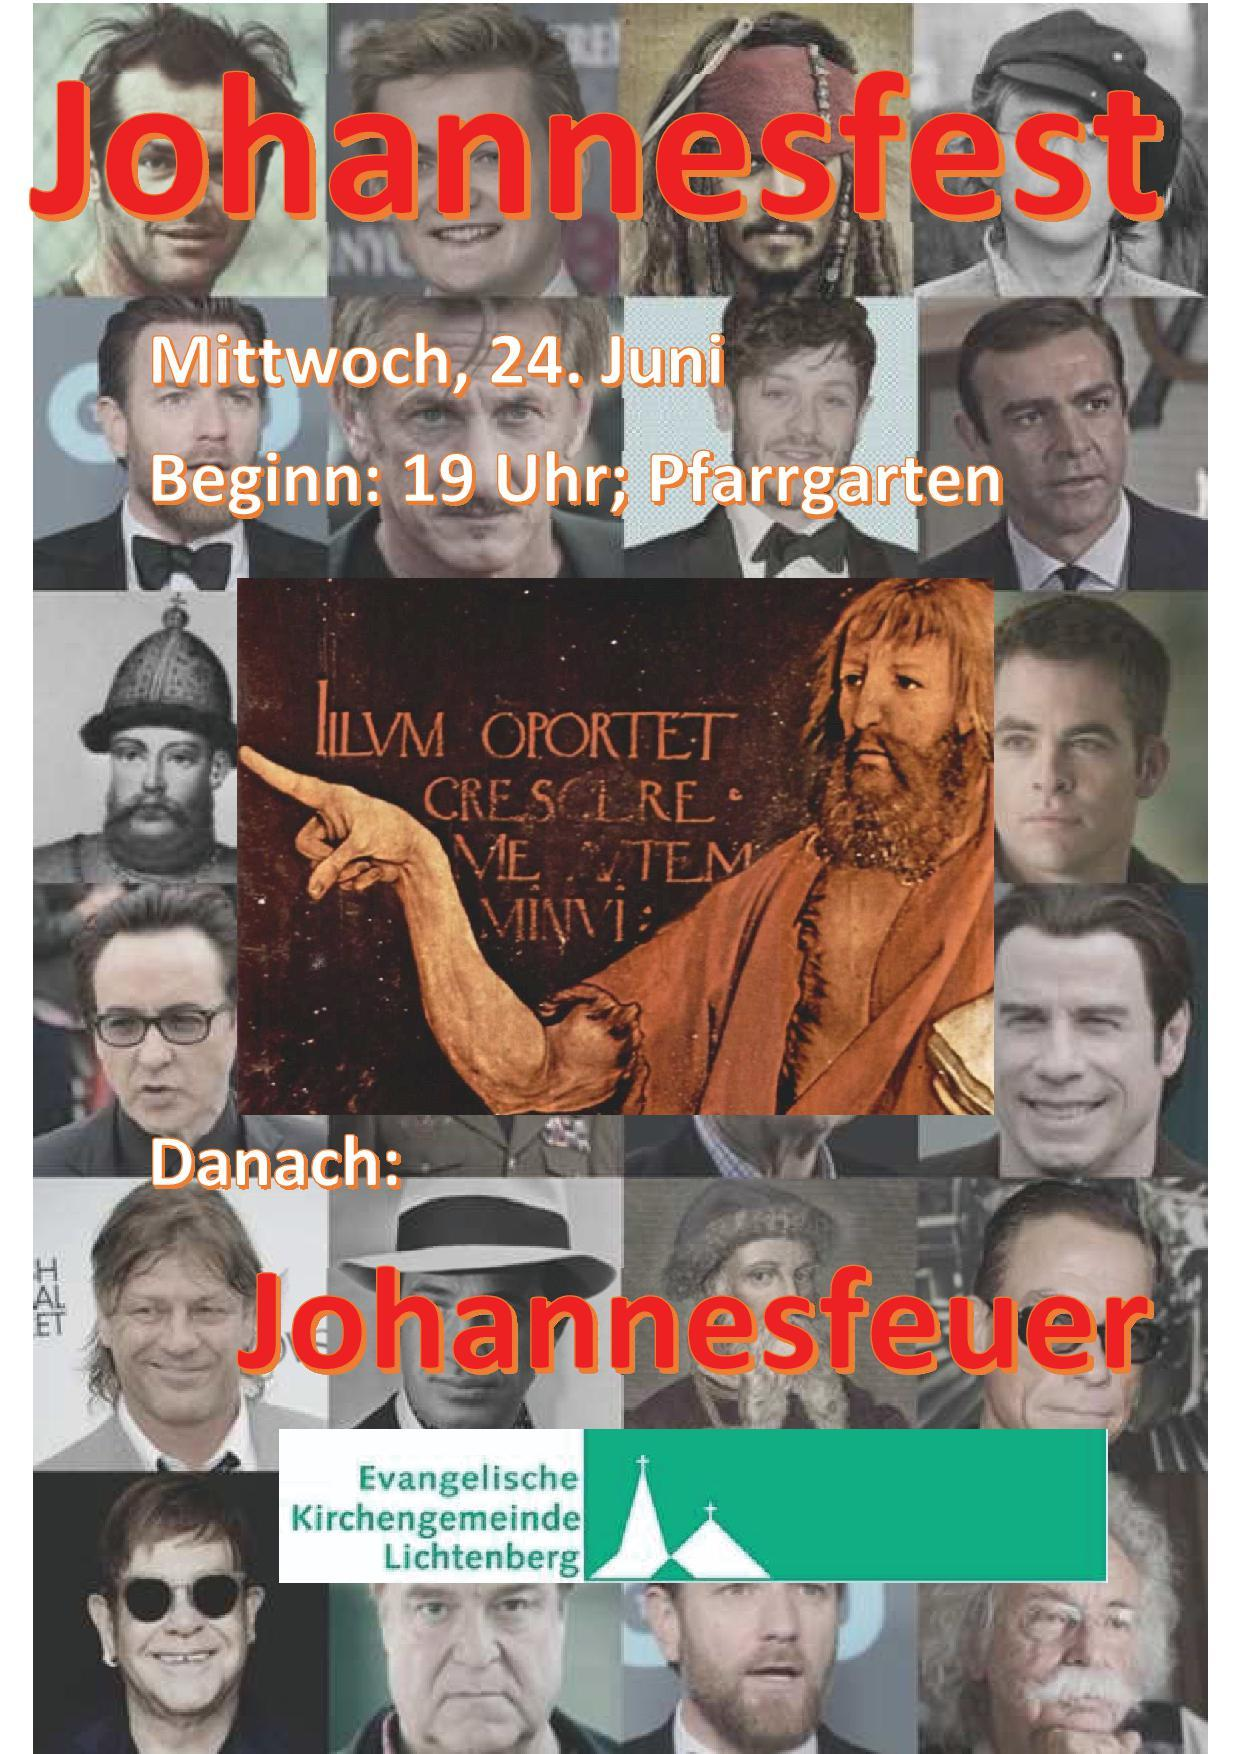 Johannesfest